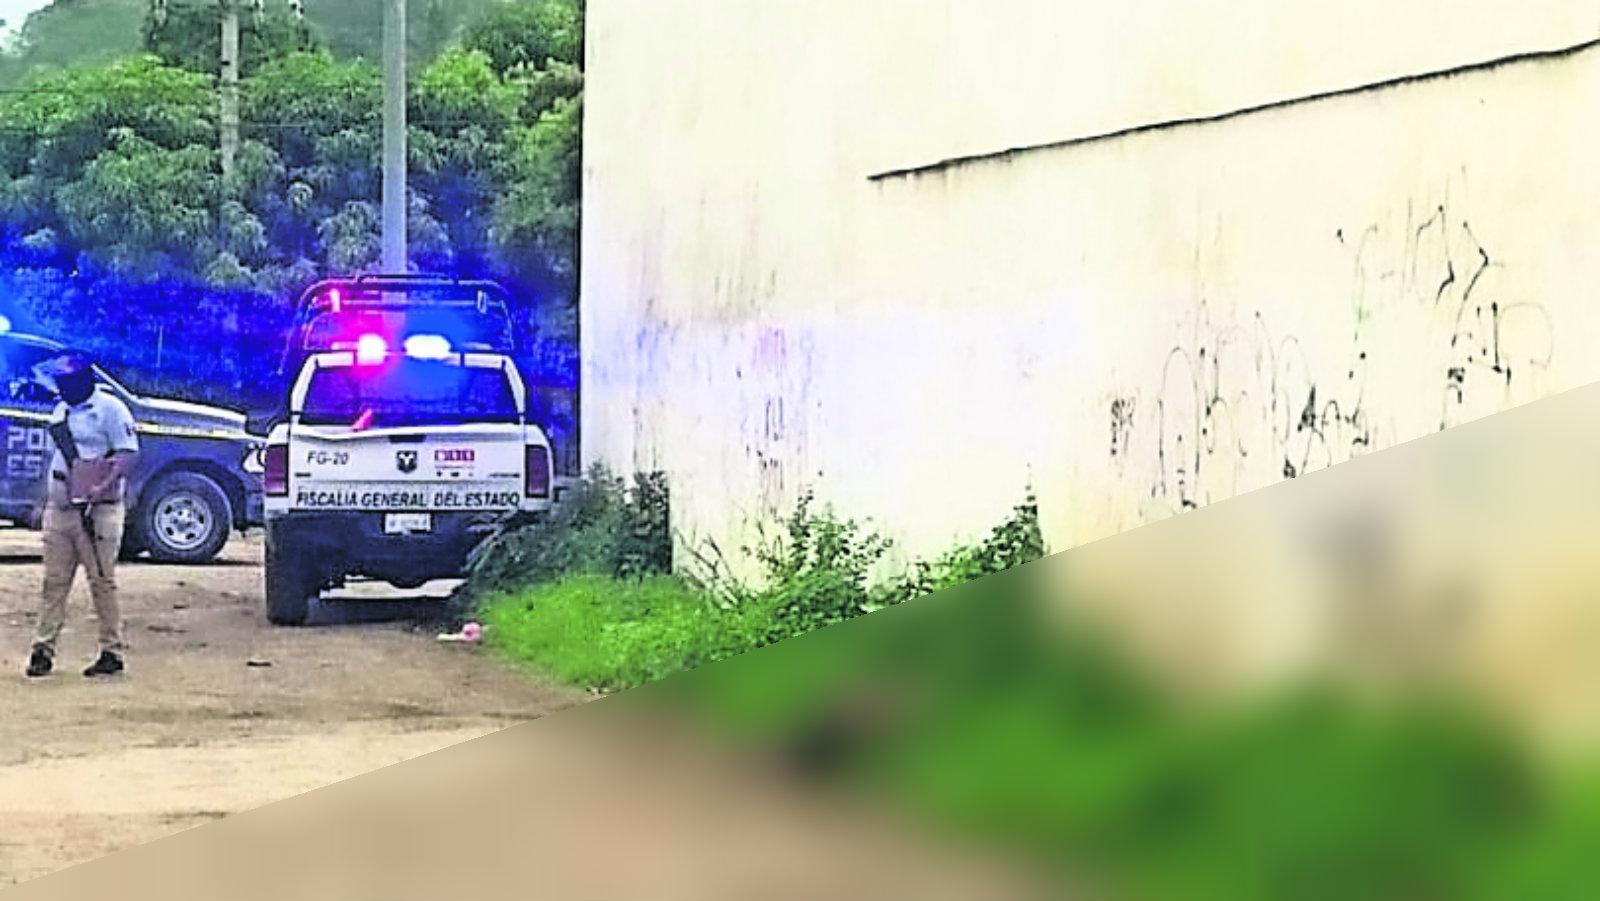 Abandonan cadáver Torturado y asfixiado Guerrero Acapulco